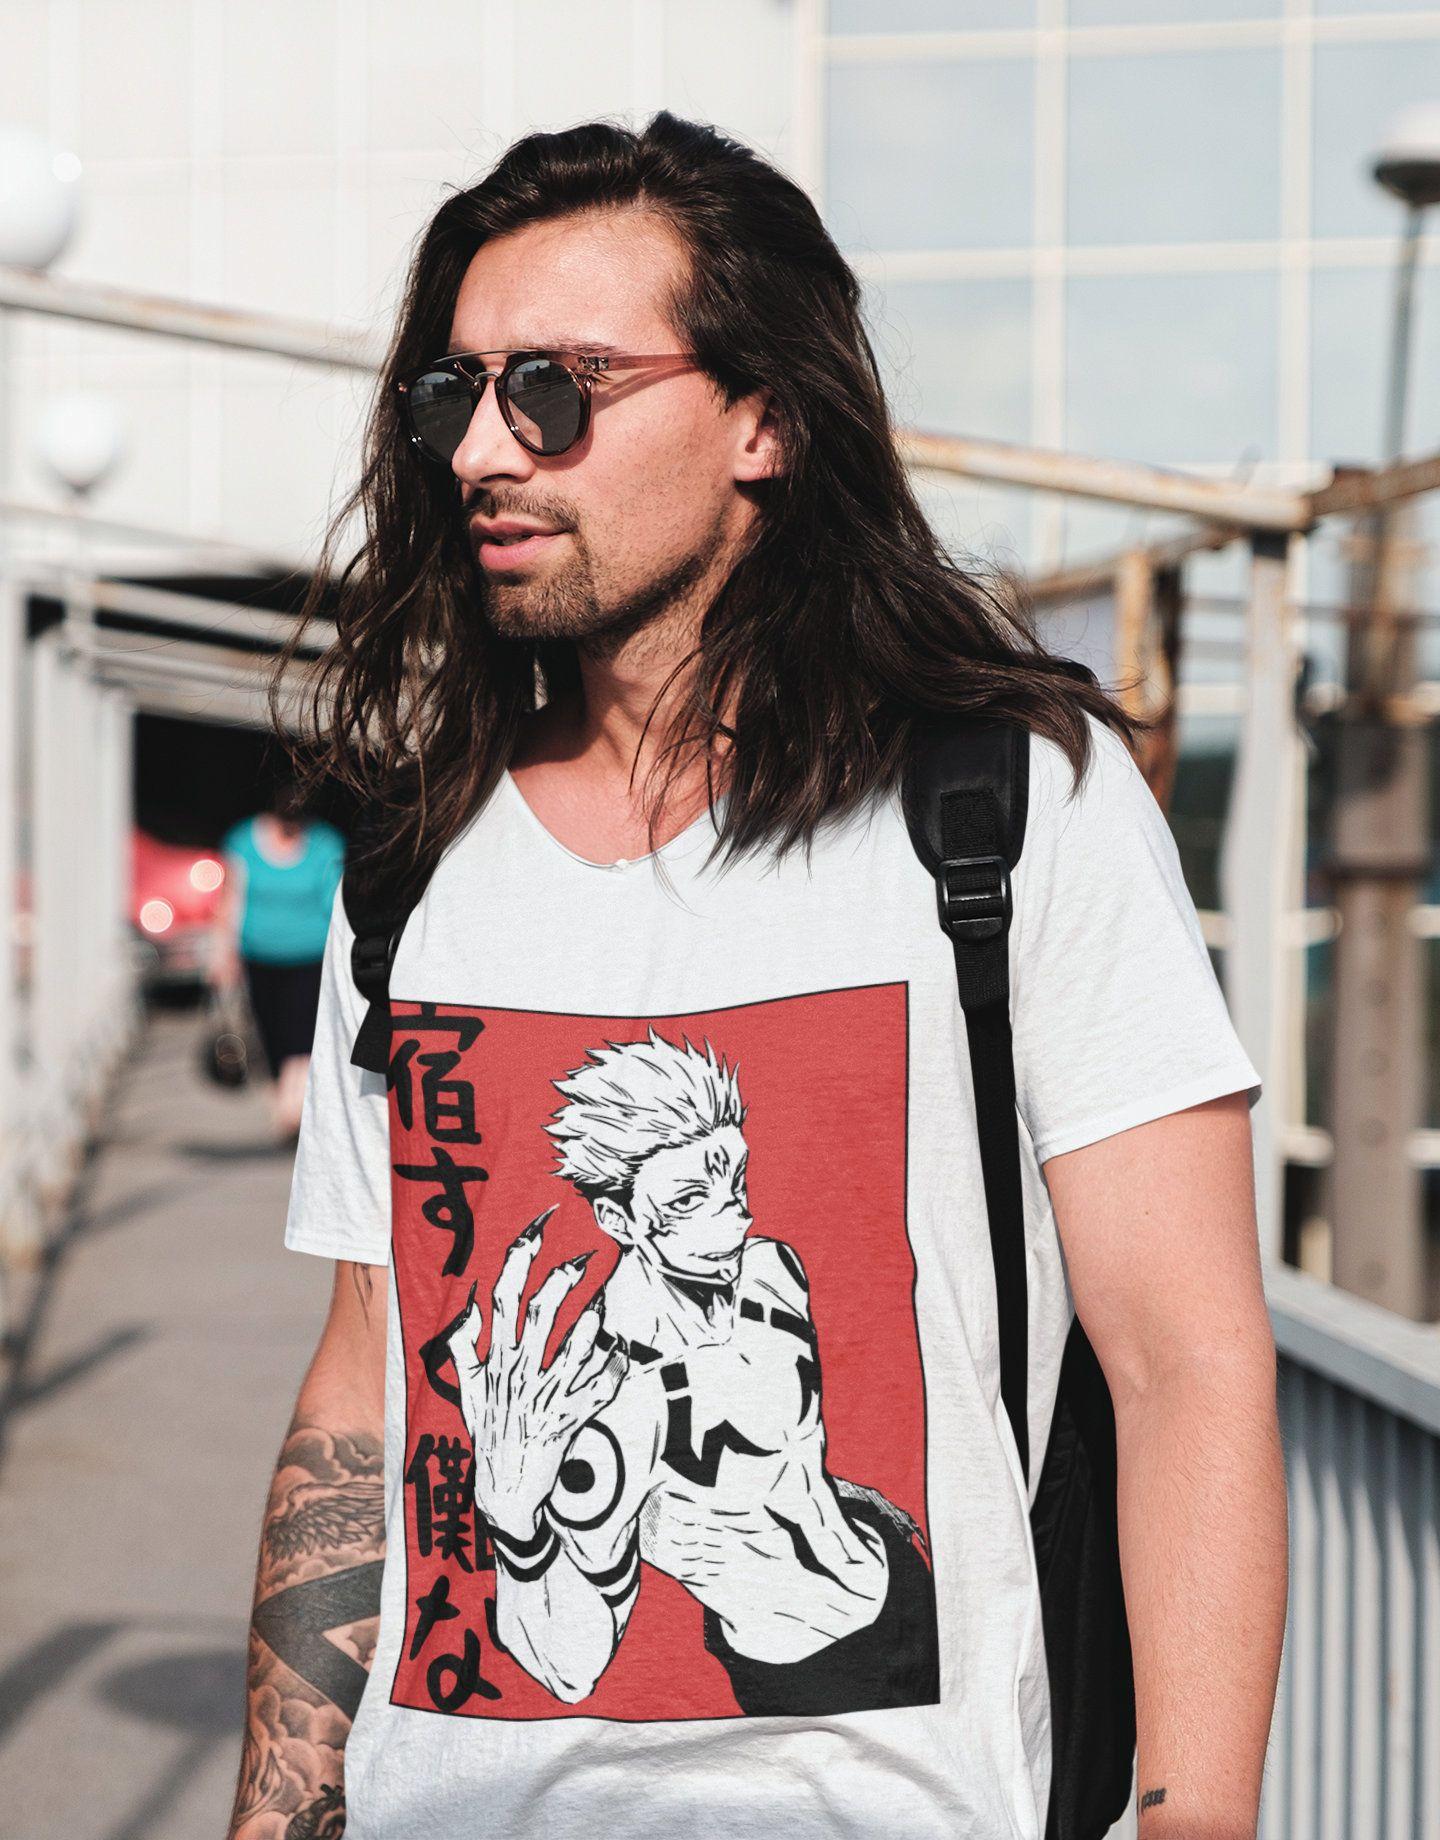 Jujutsu Kaisen T Shirt Sukuna T Shirt Gojo T Shirt Satoru Gojo T Shirt Yuji Itadori T Shirt Fushiguro T Shirt In 2021 Kawaii Hoodie Anime Hoodie Trending Outfits